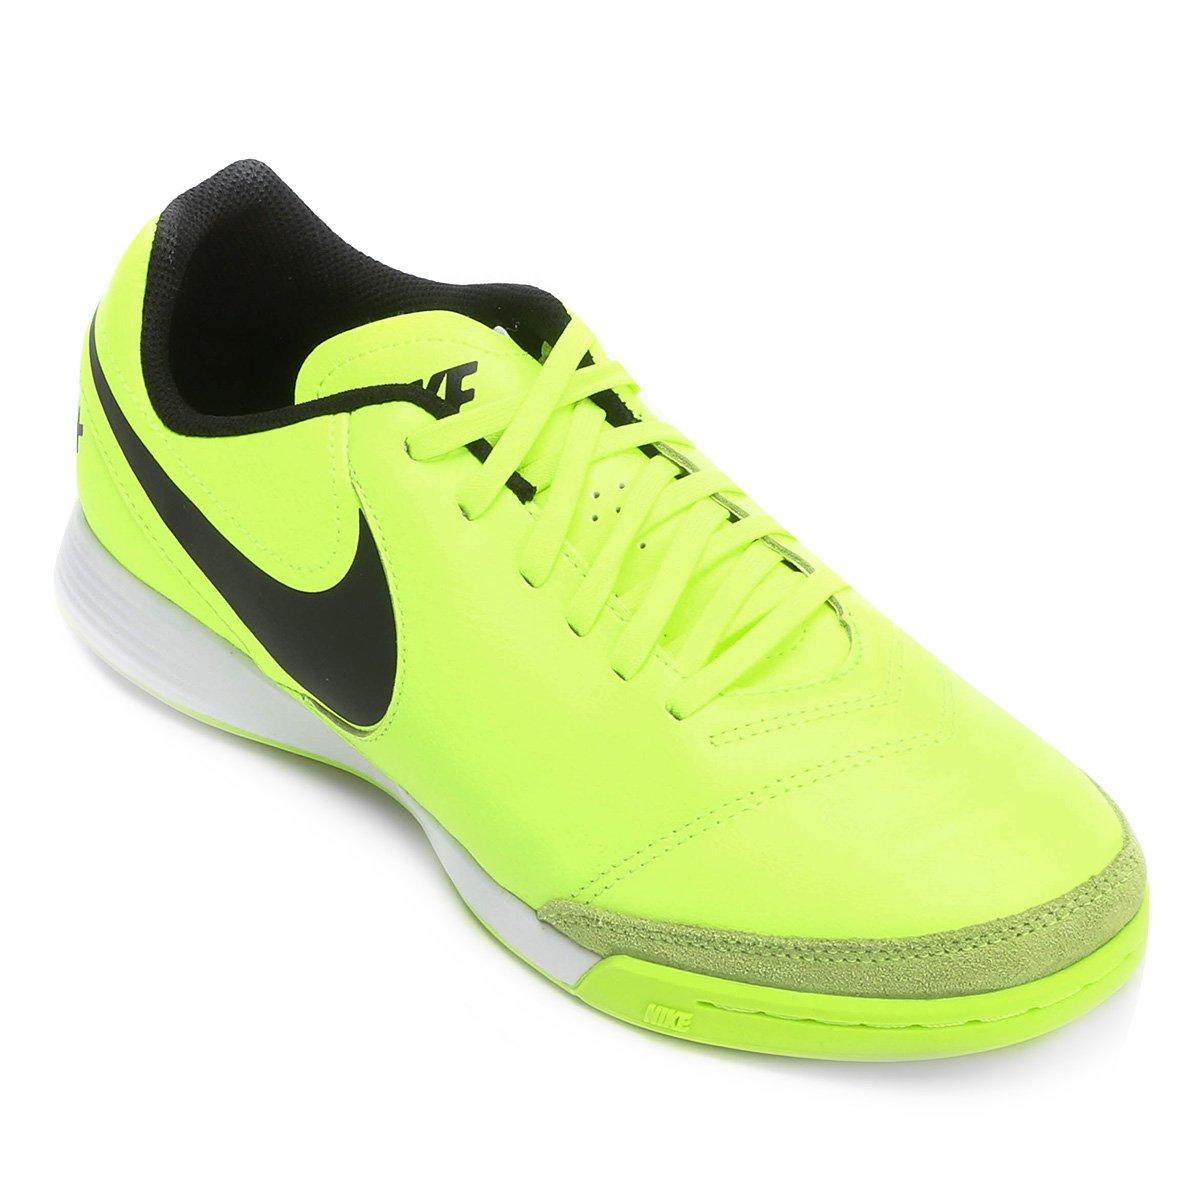 449bf7a365b82 Chuteira Futsal Nike Tiempo Genio 2 Leather IC - Compre Agora